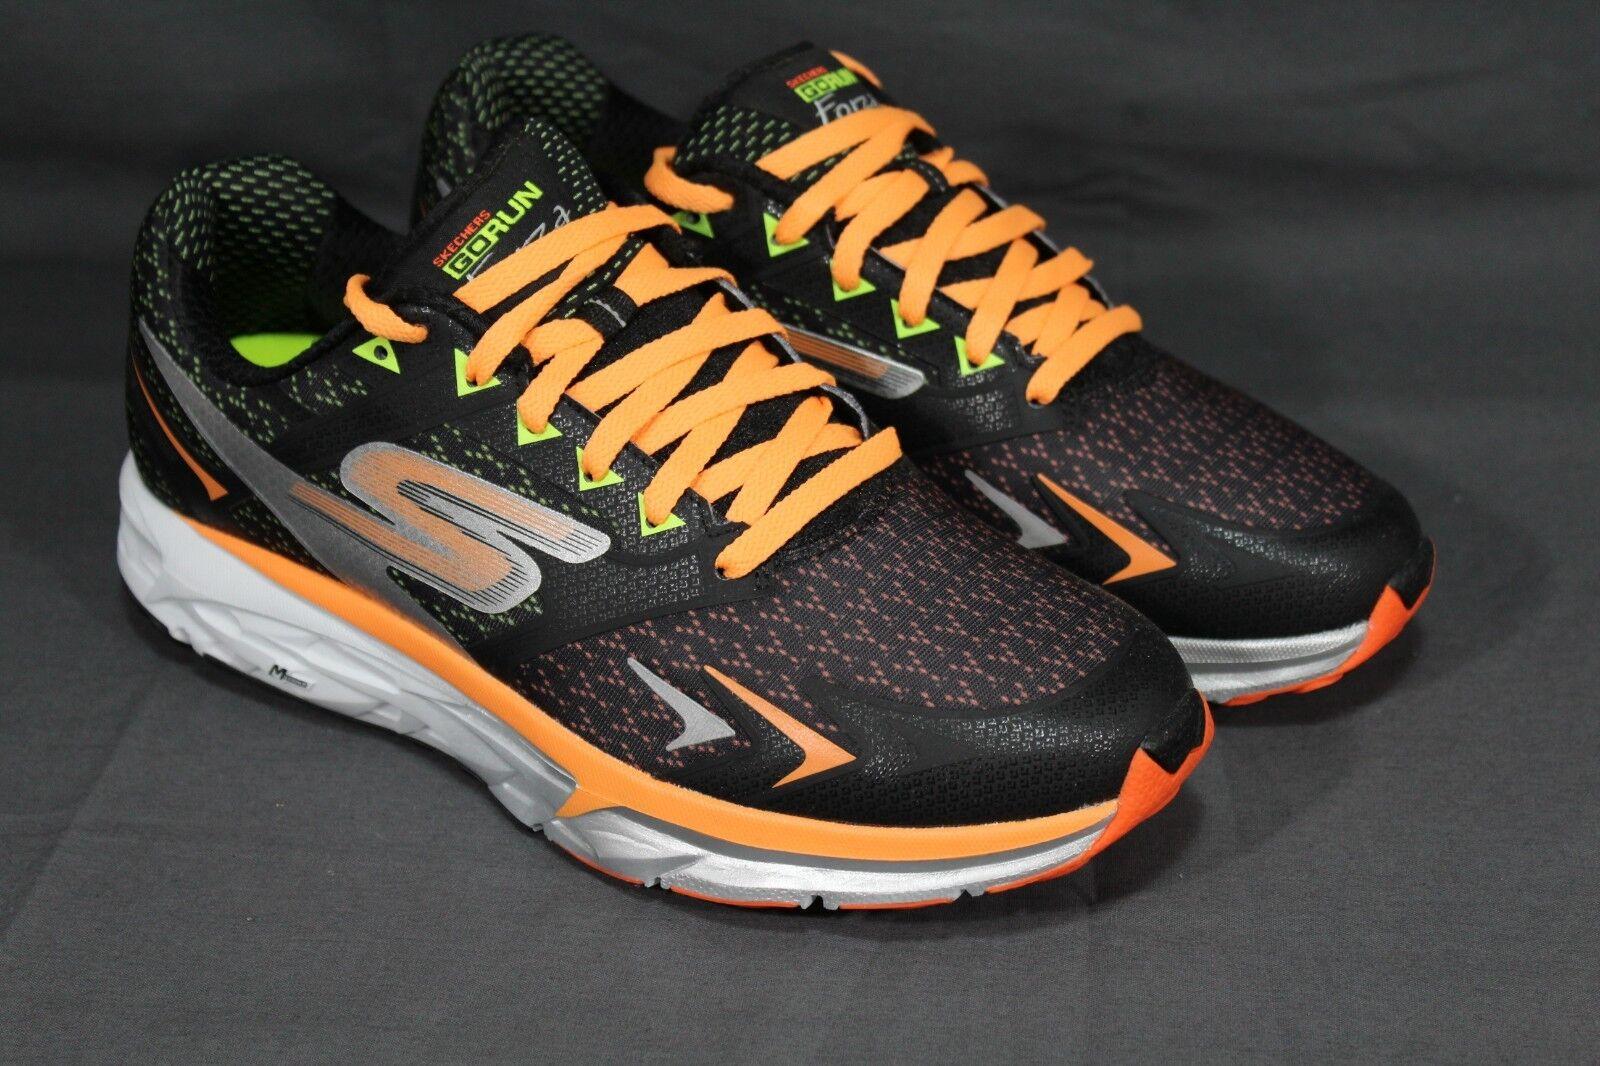 1eb8731f8d11 NEW GoRun Forza Mens Running Shoes 54105 BKOR Size 9.5 D Skechers ...